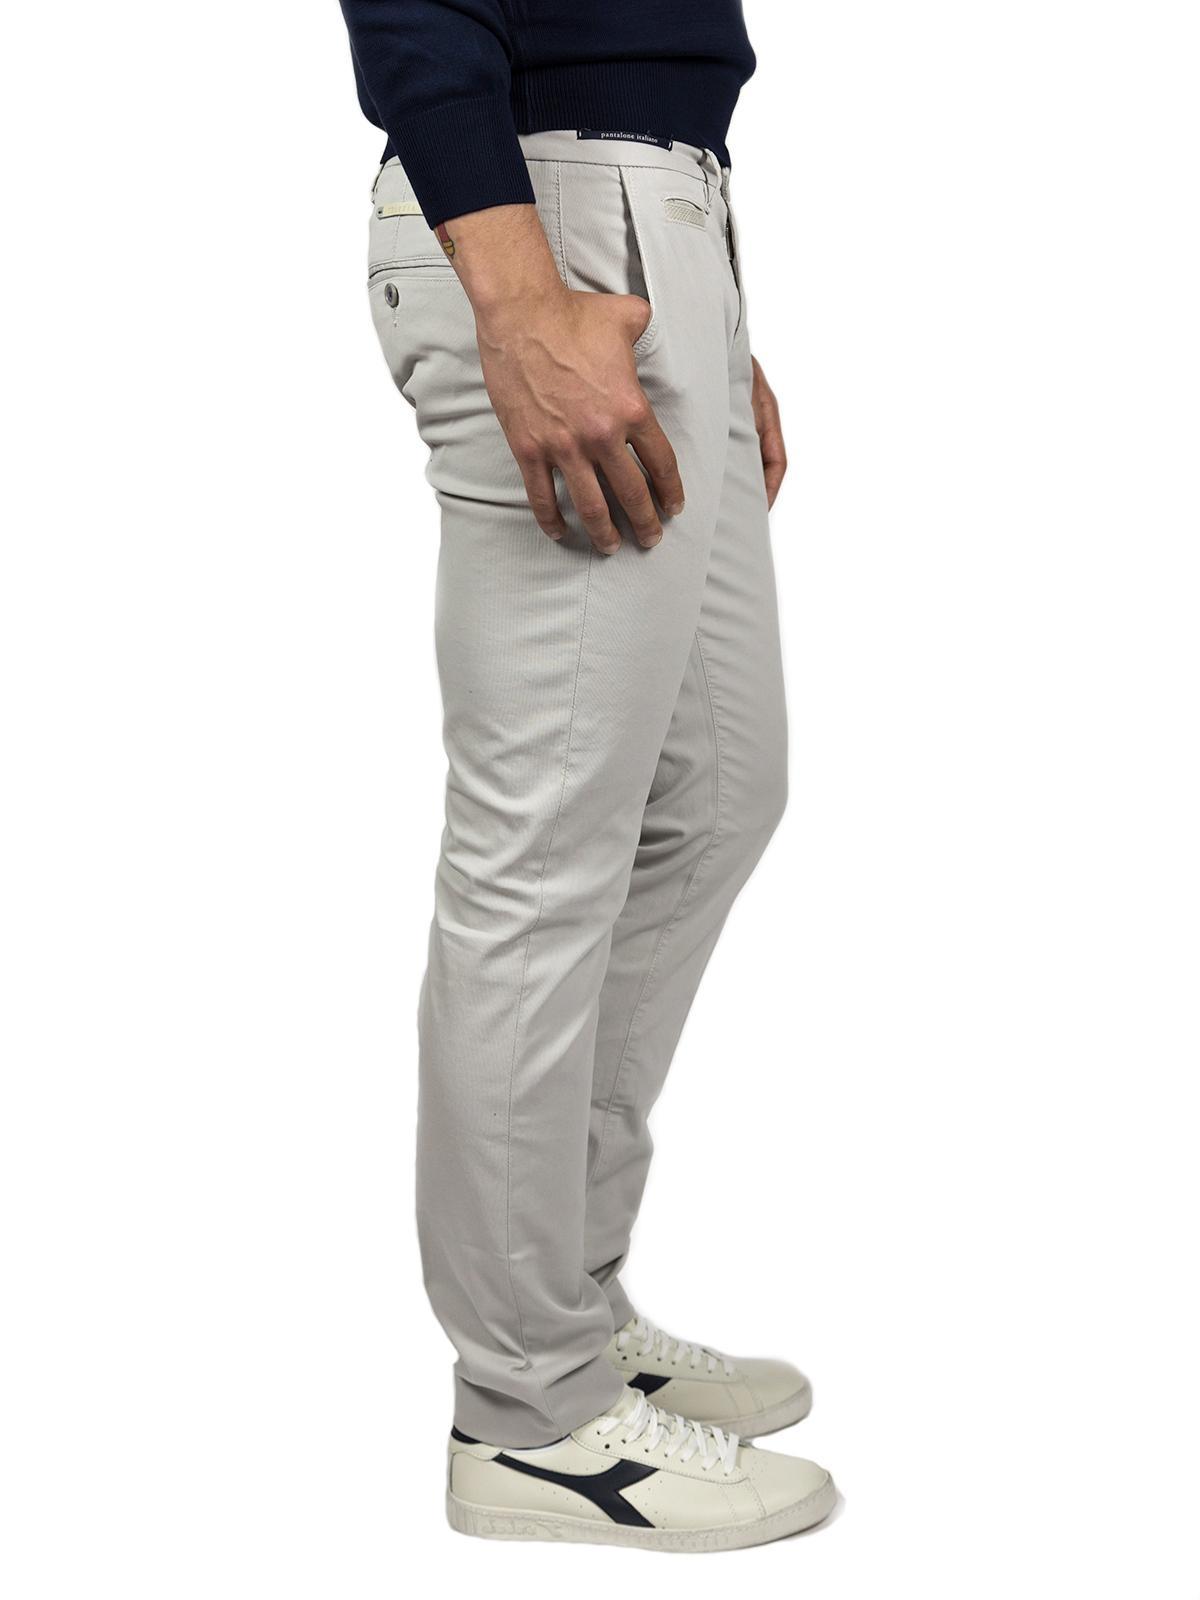 Teleria Zed Pantalone Robin F17 DR